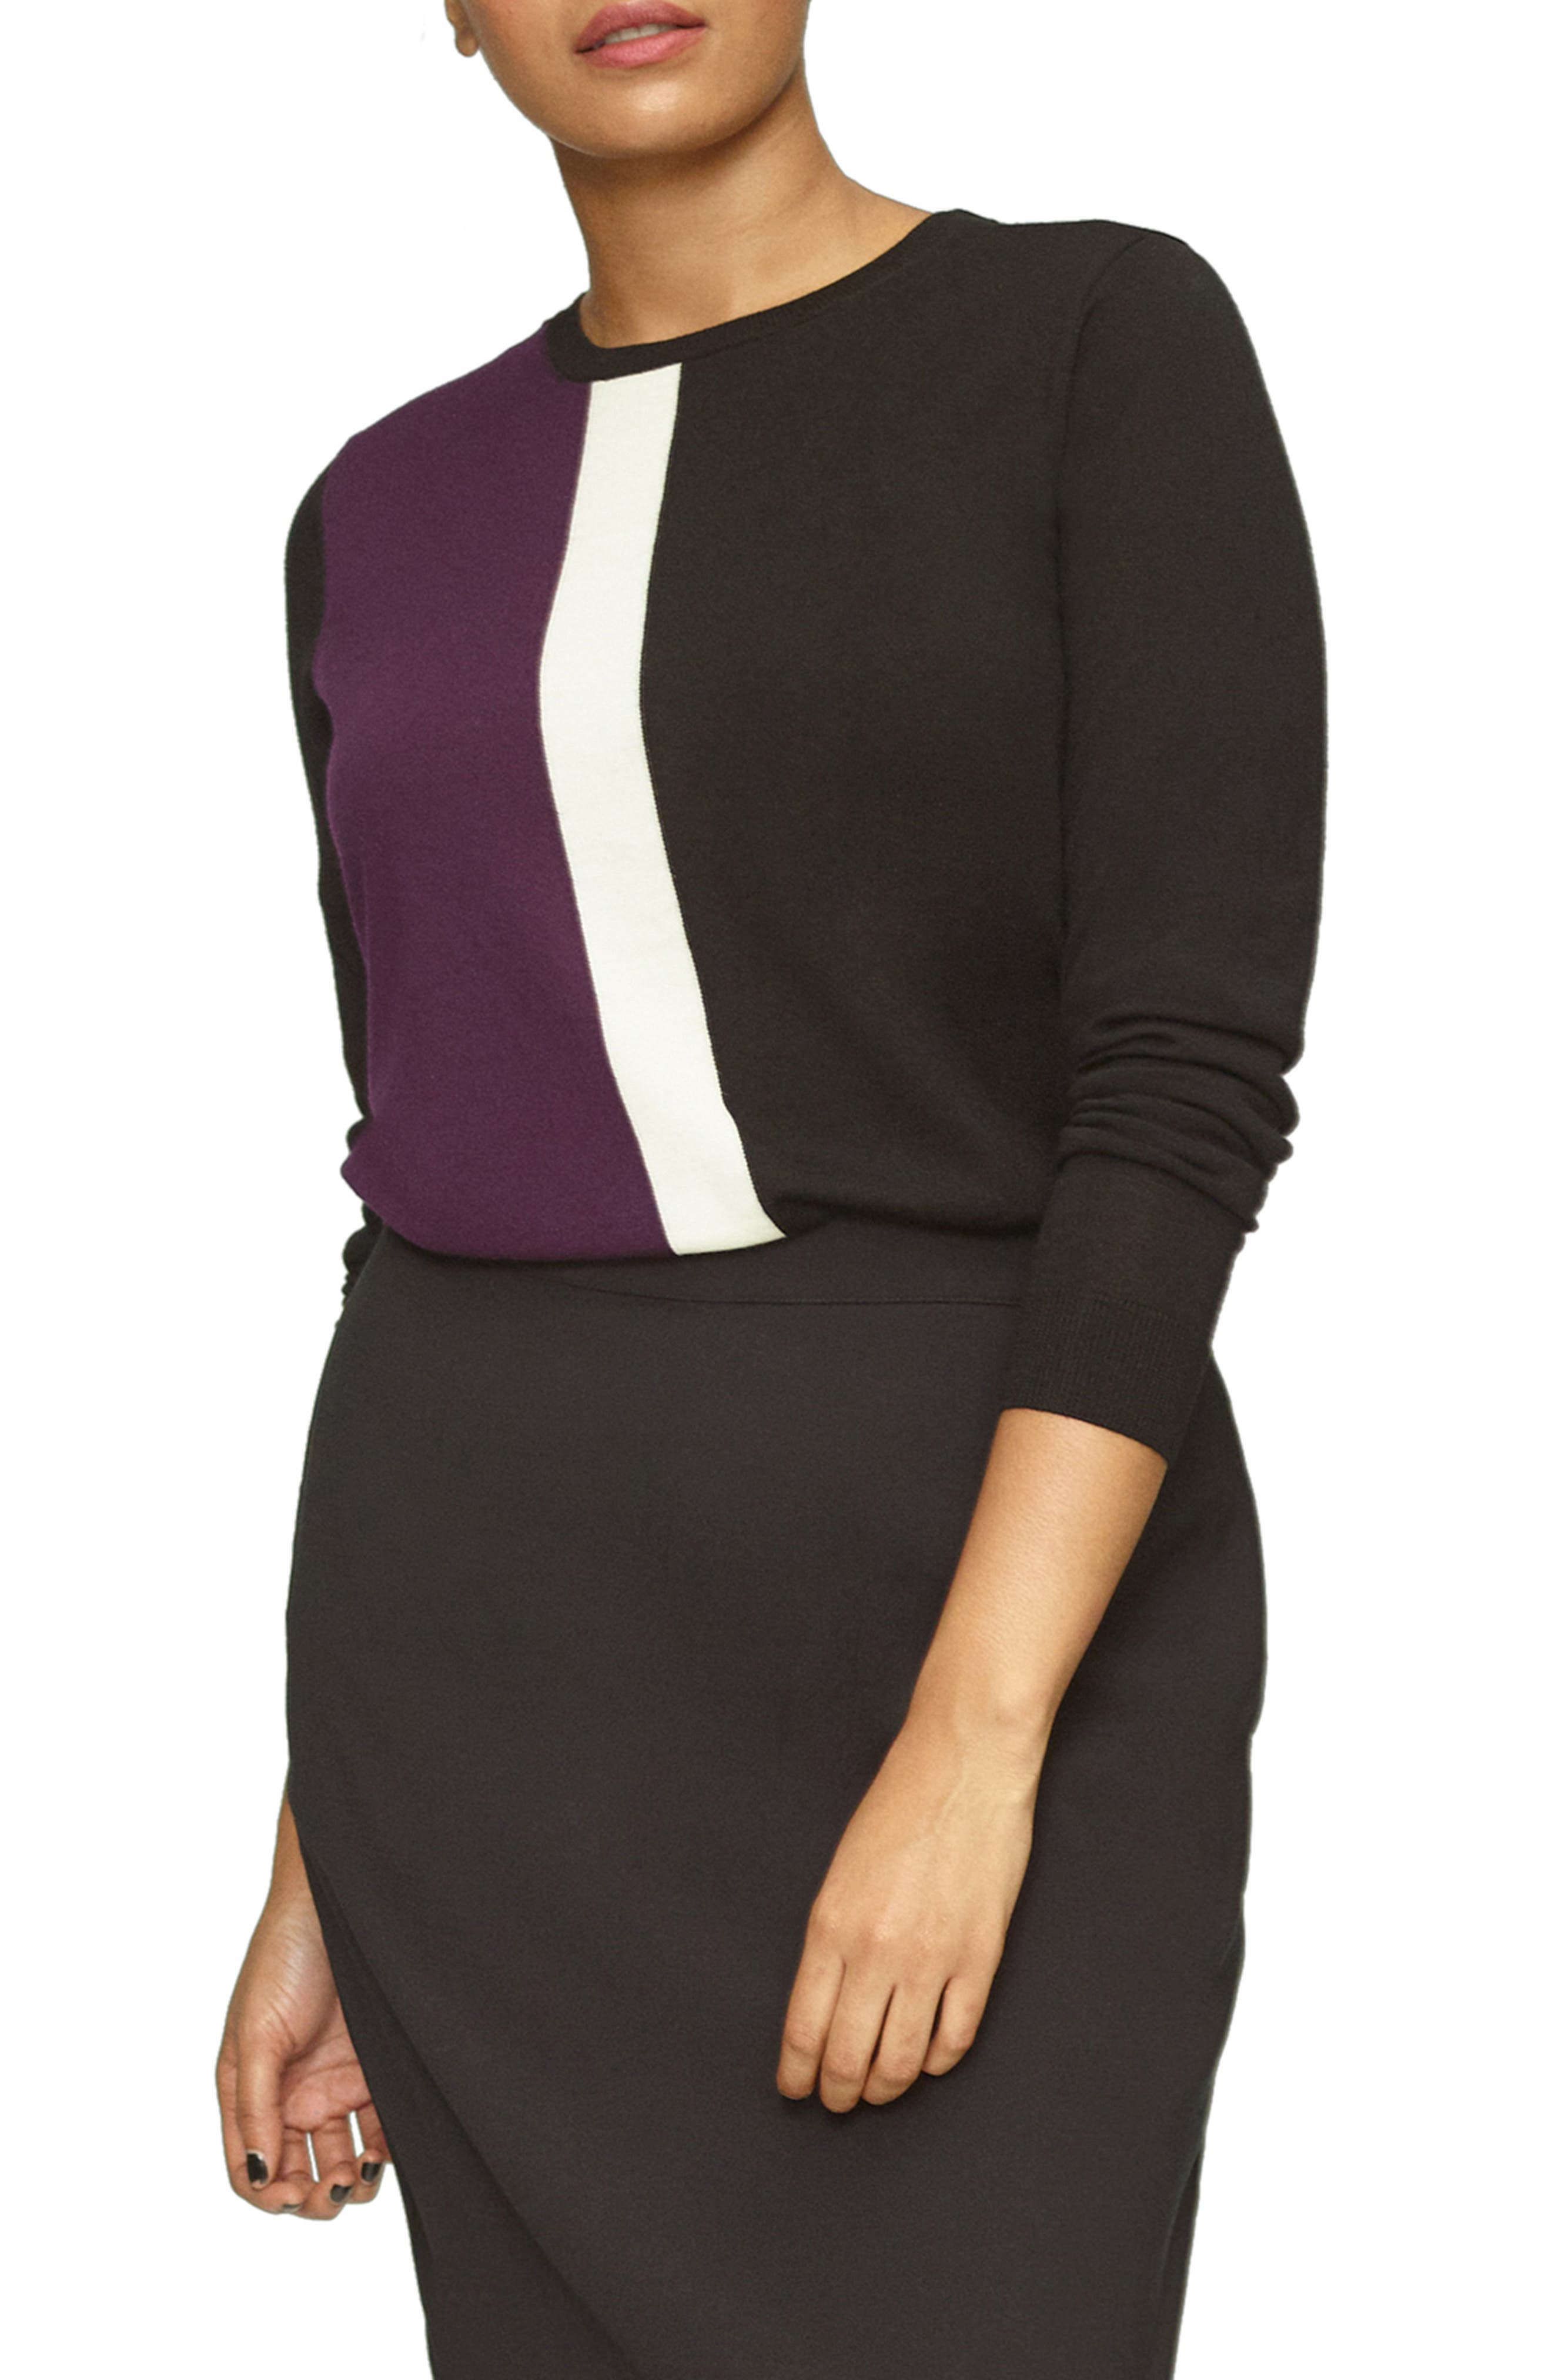 Plus Size Universal Standard Colorblock Merino Wool Sweater, Size M (18W-20W) - Black